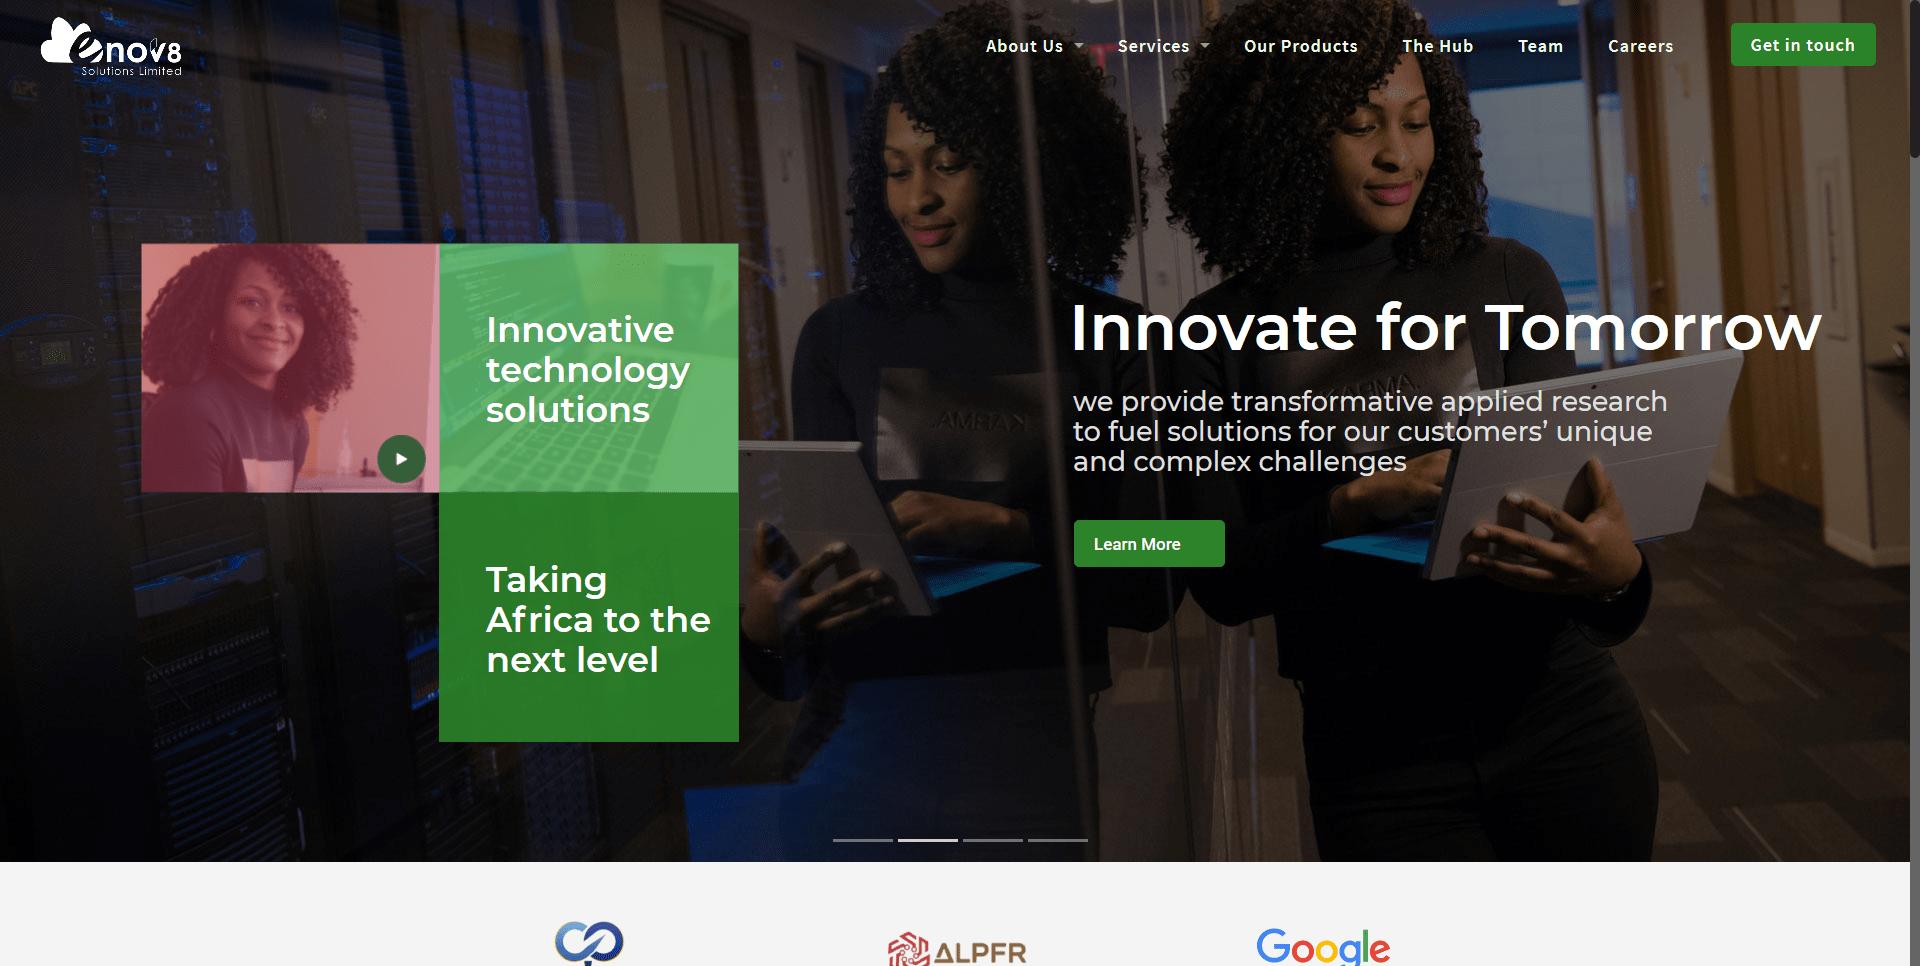 Enov8 Solutions website screenshot